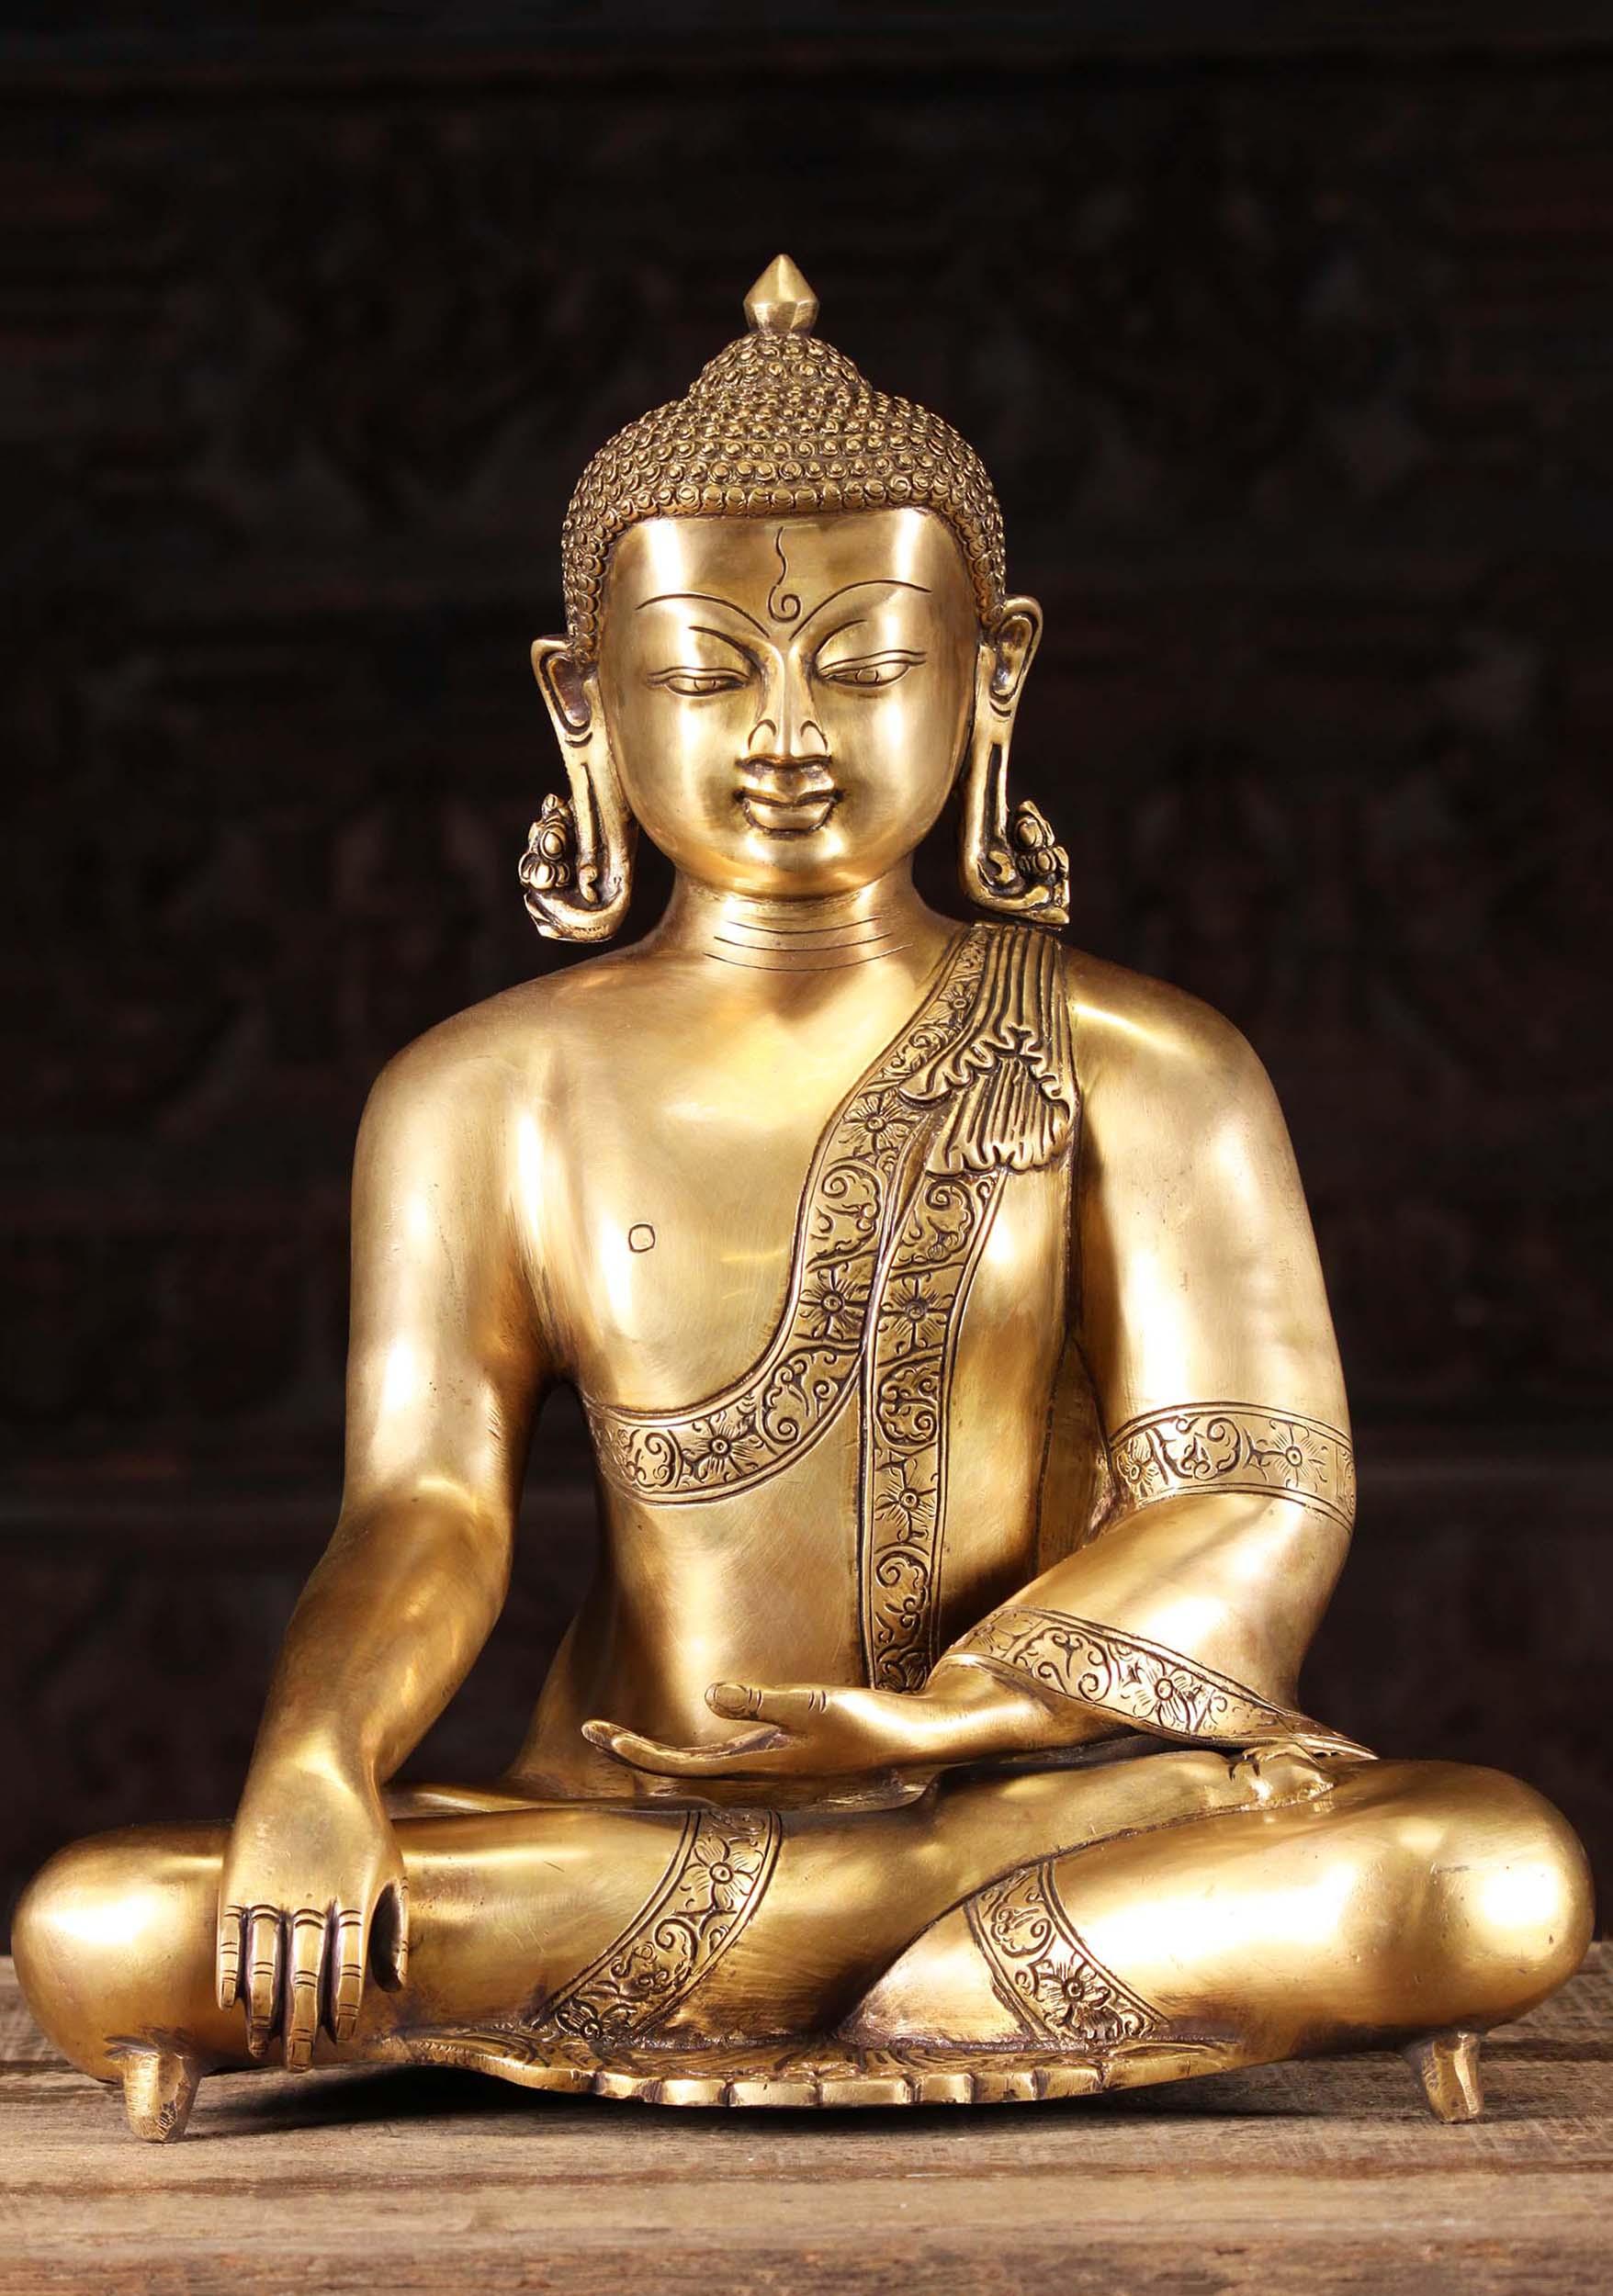 Brass Earth Touching Indian Buddha Statue 15 72bs31z Hindu Gods Buddha Statues